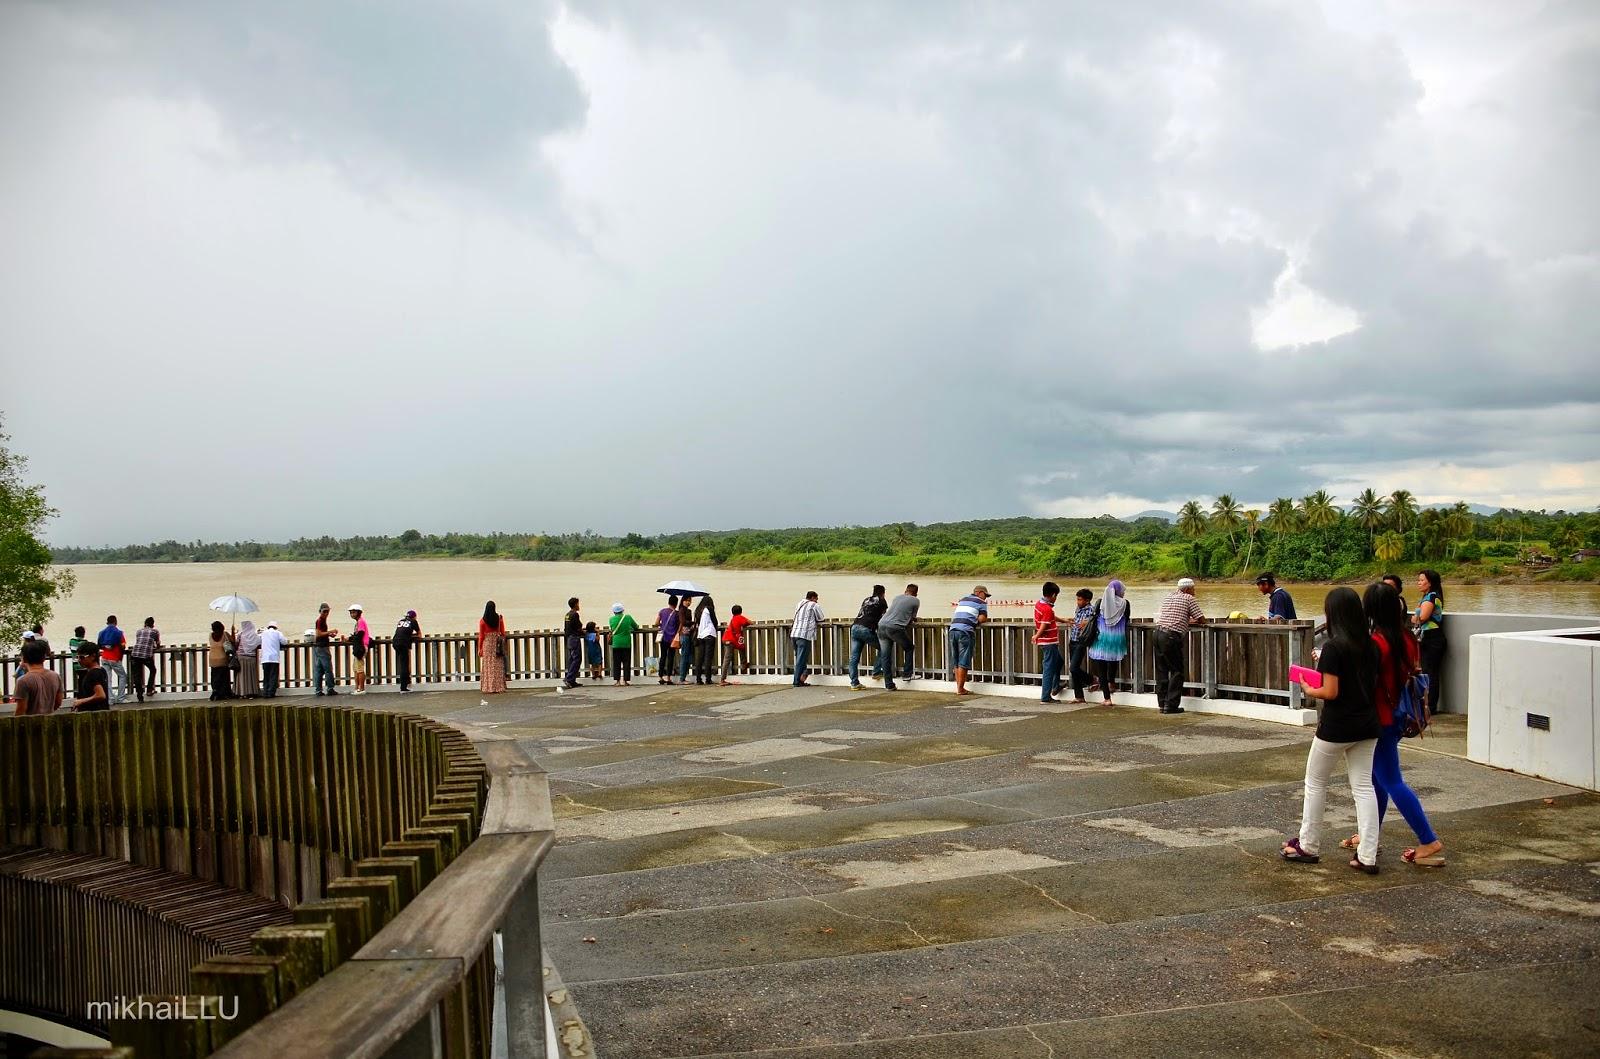 The panoramic vantage view of Batang Lupar | mikhaiLLU